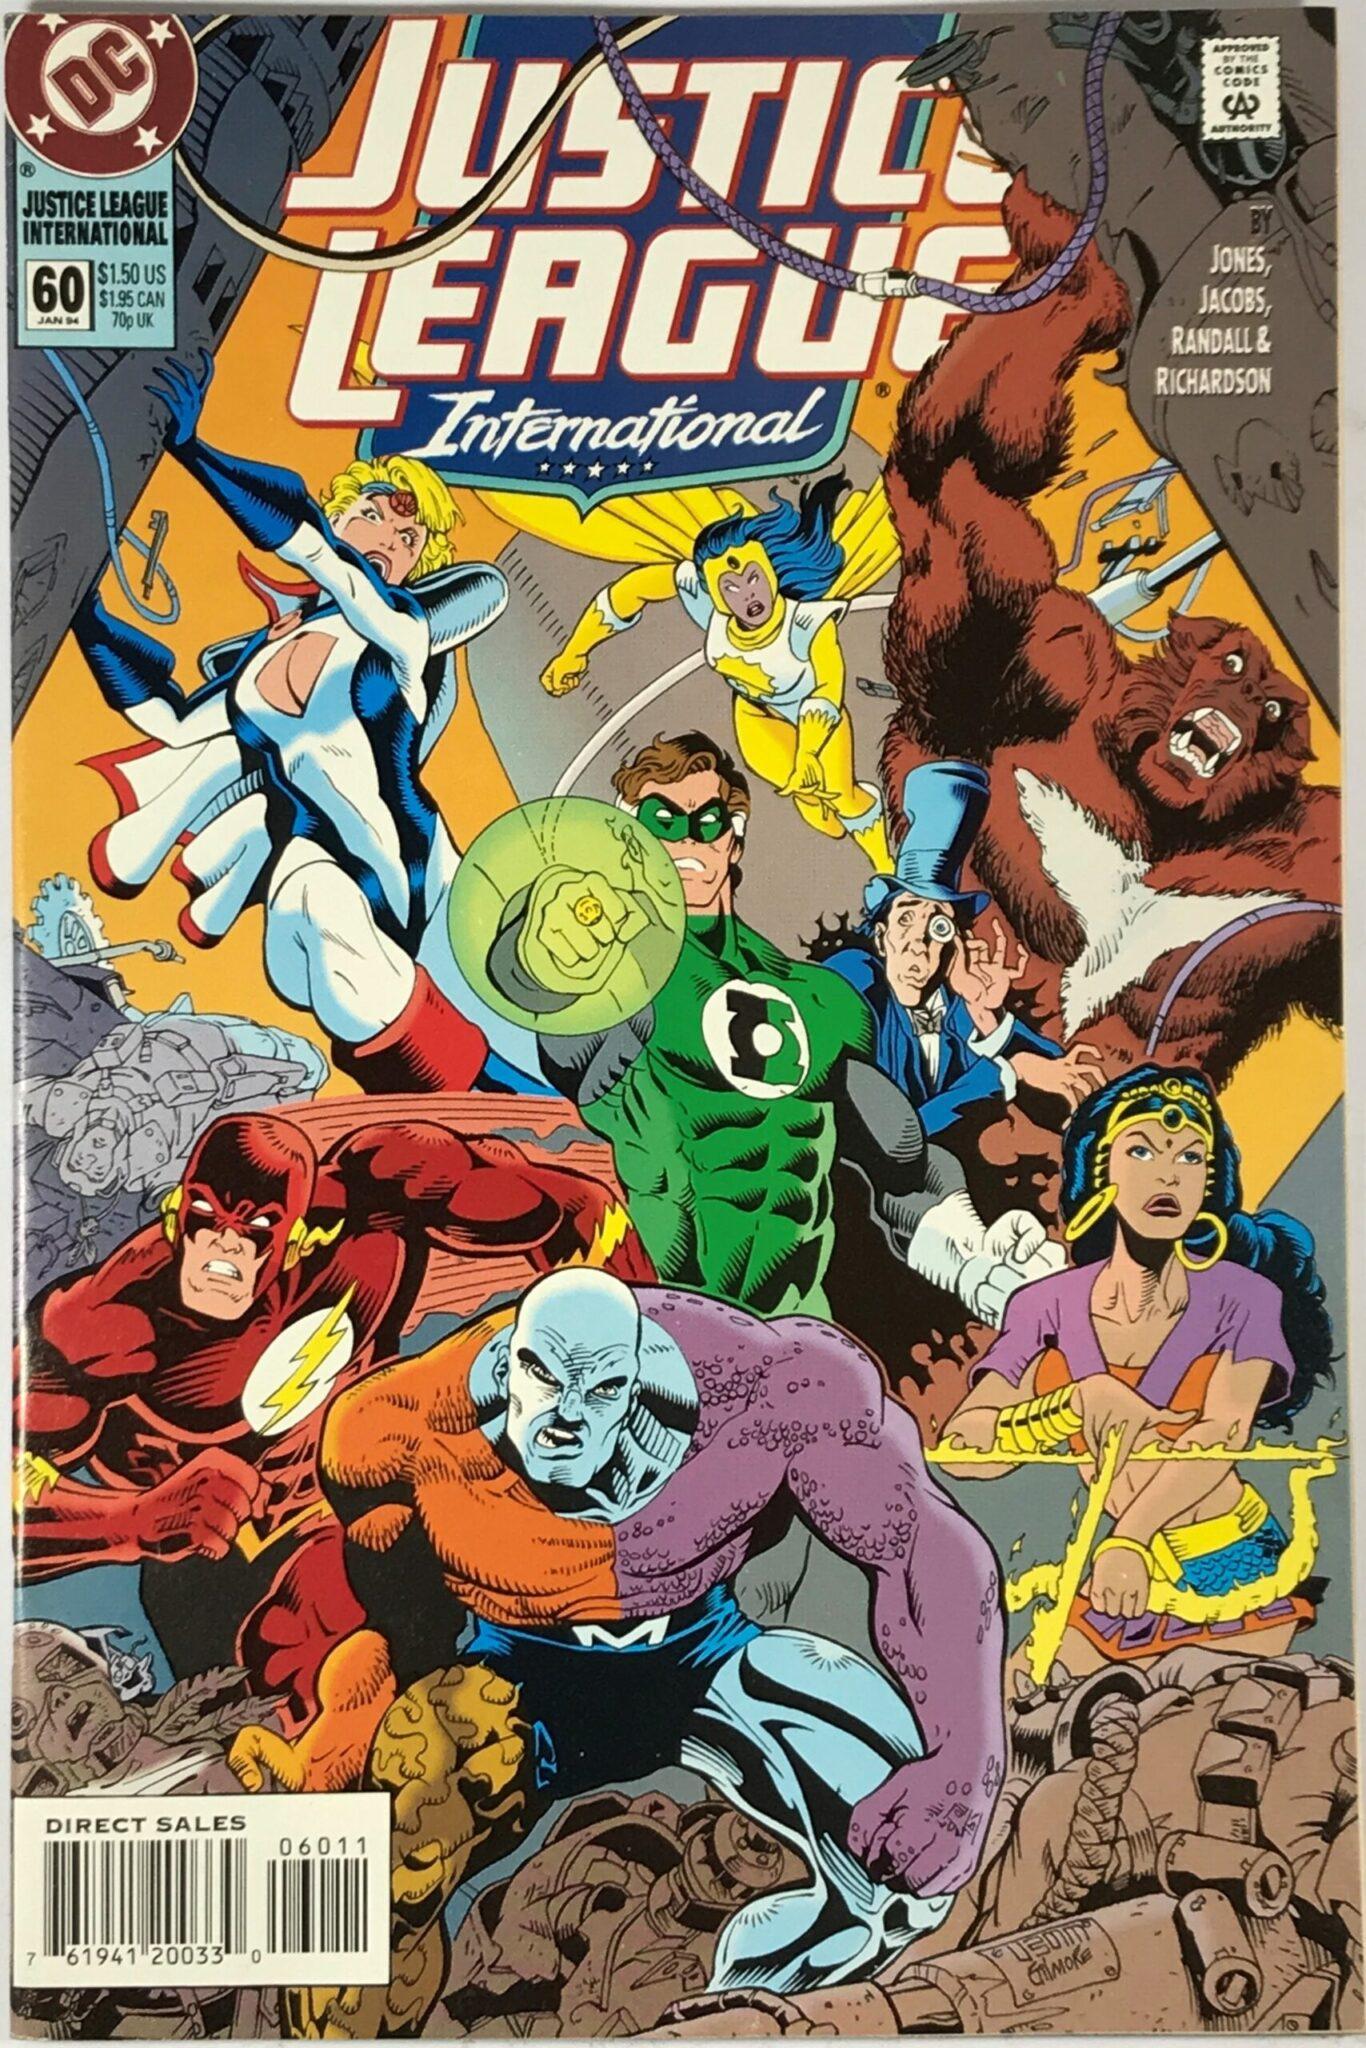 Justice League International Vol. 2 (1993-1994) #60 - Very Fine 1